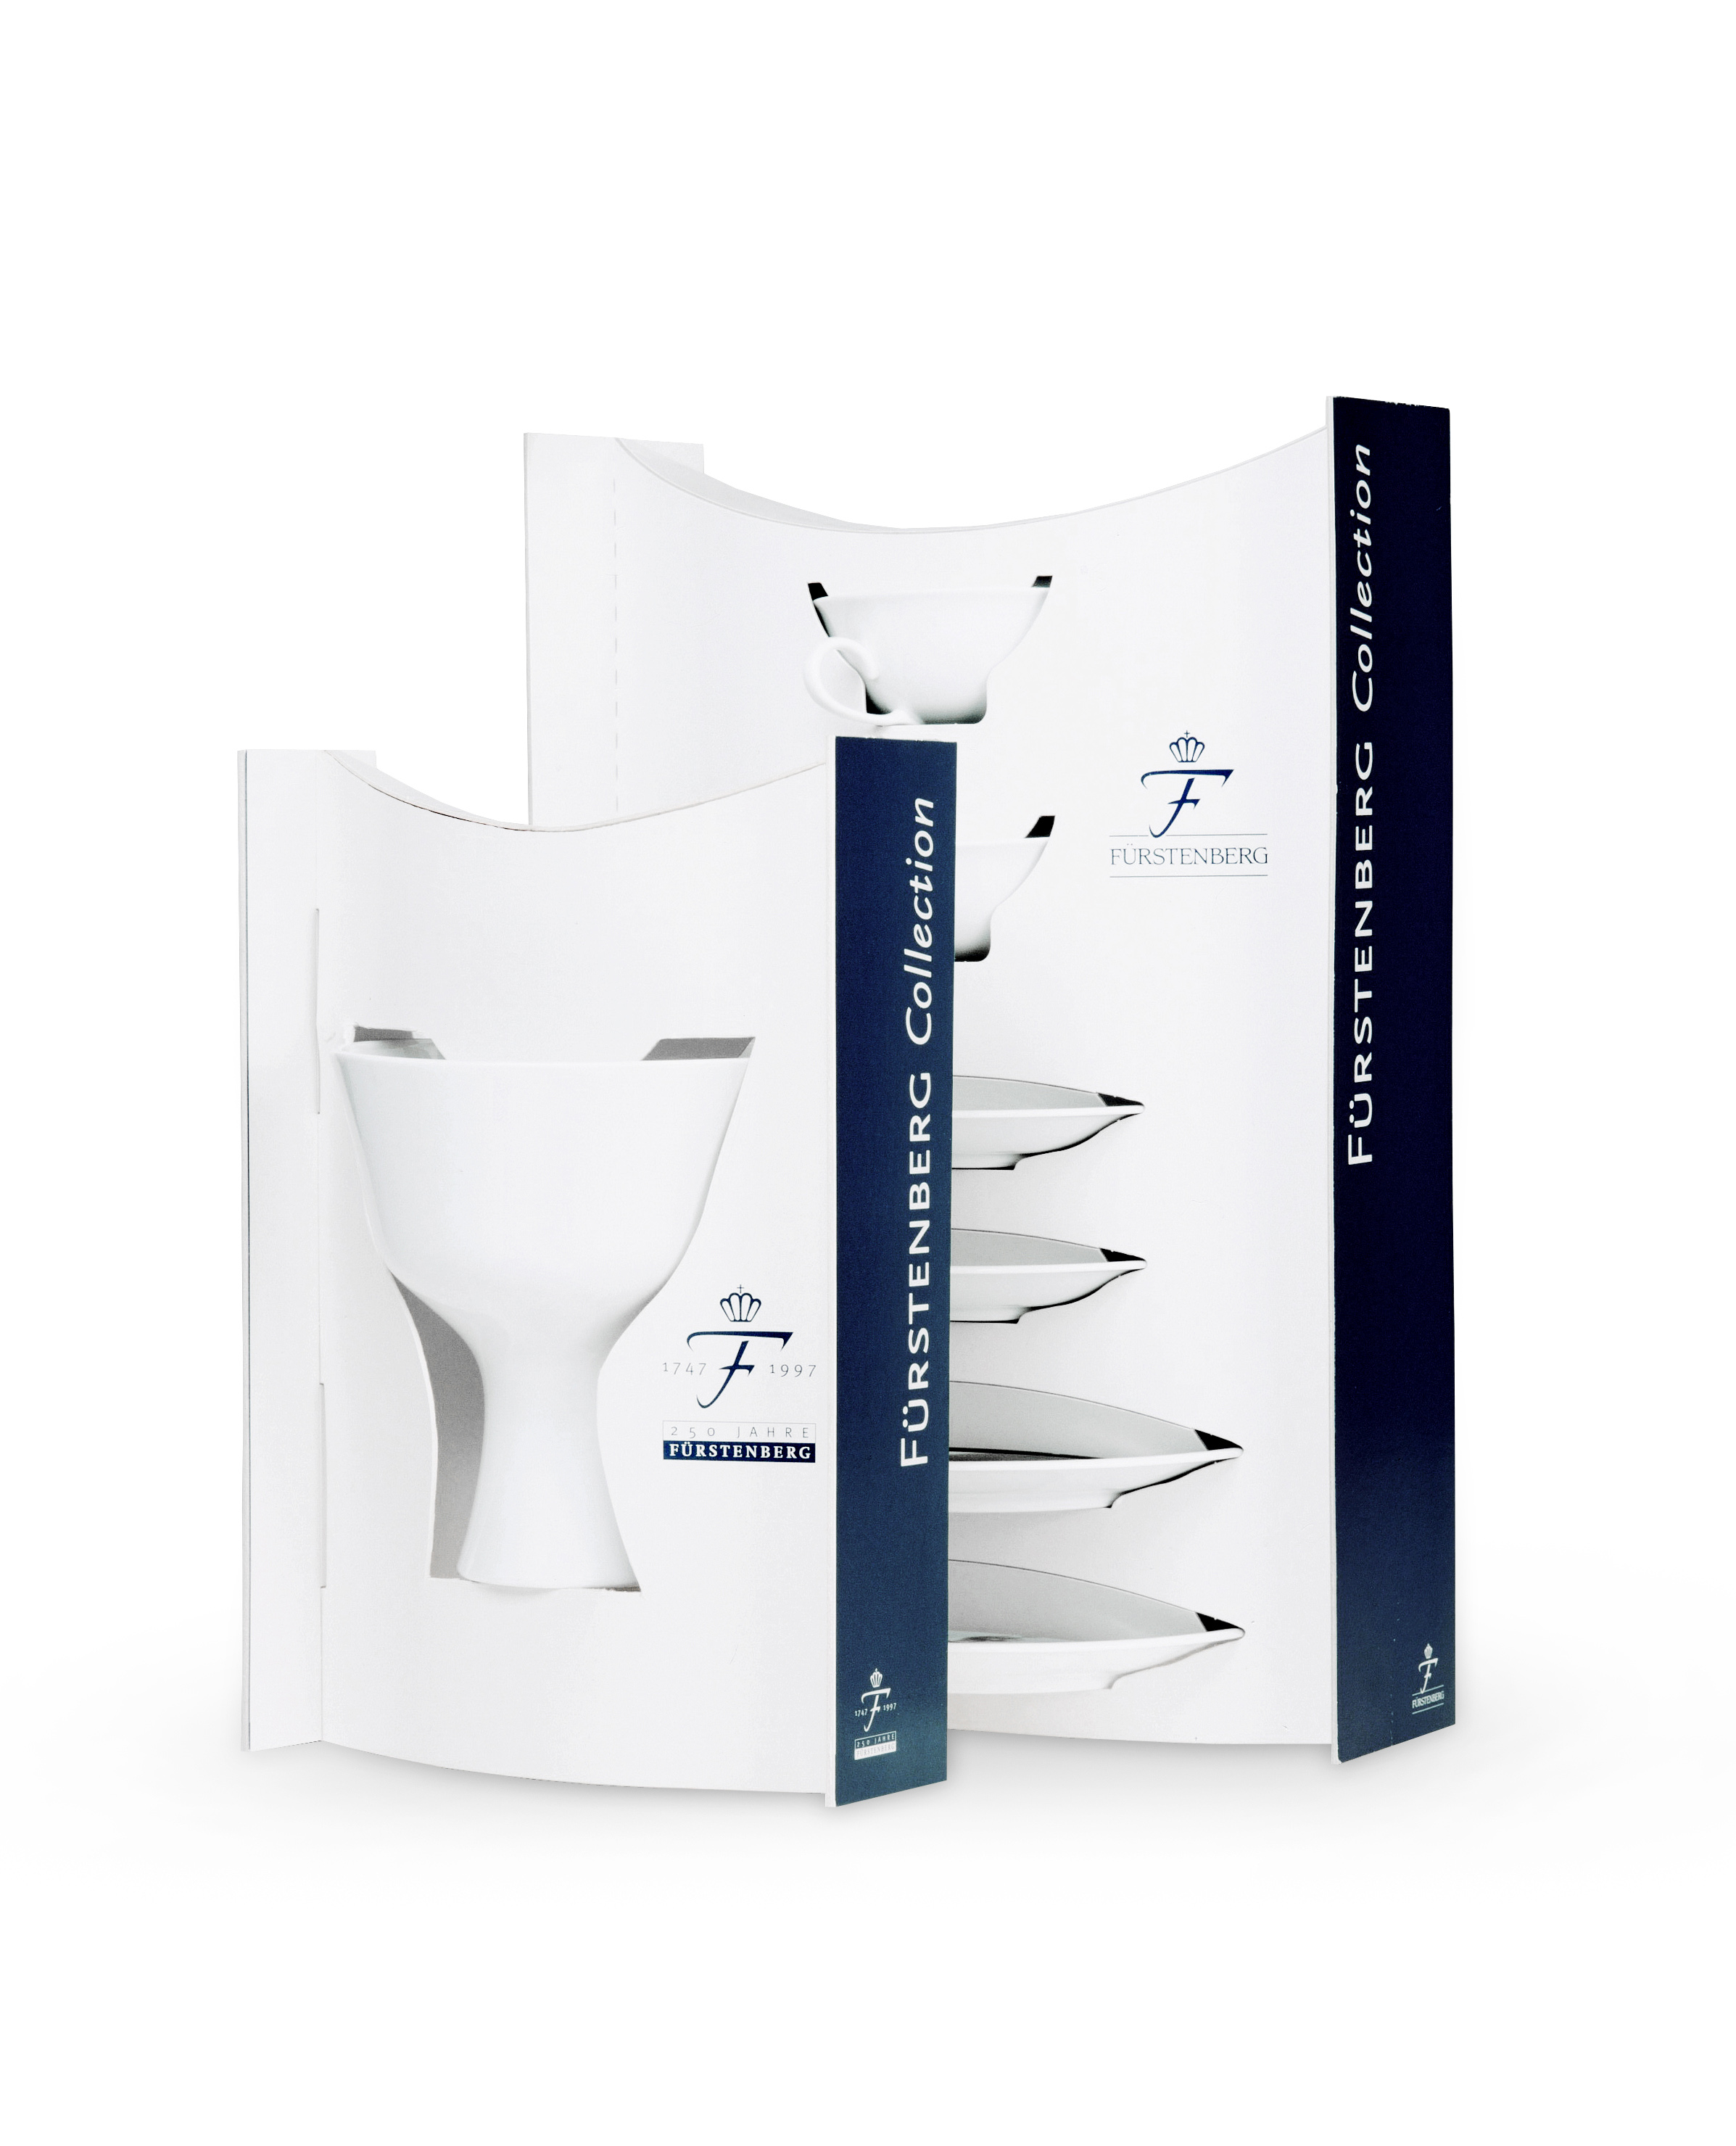 Barski design f rstenberg collection for Haushalt design